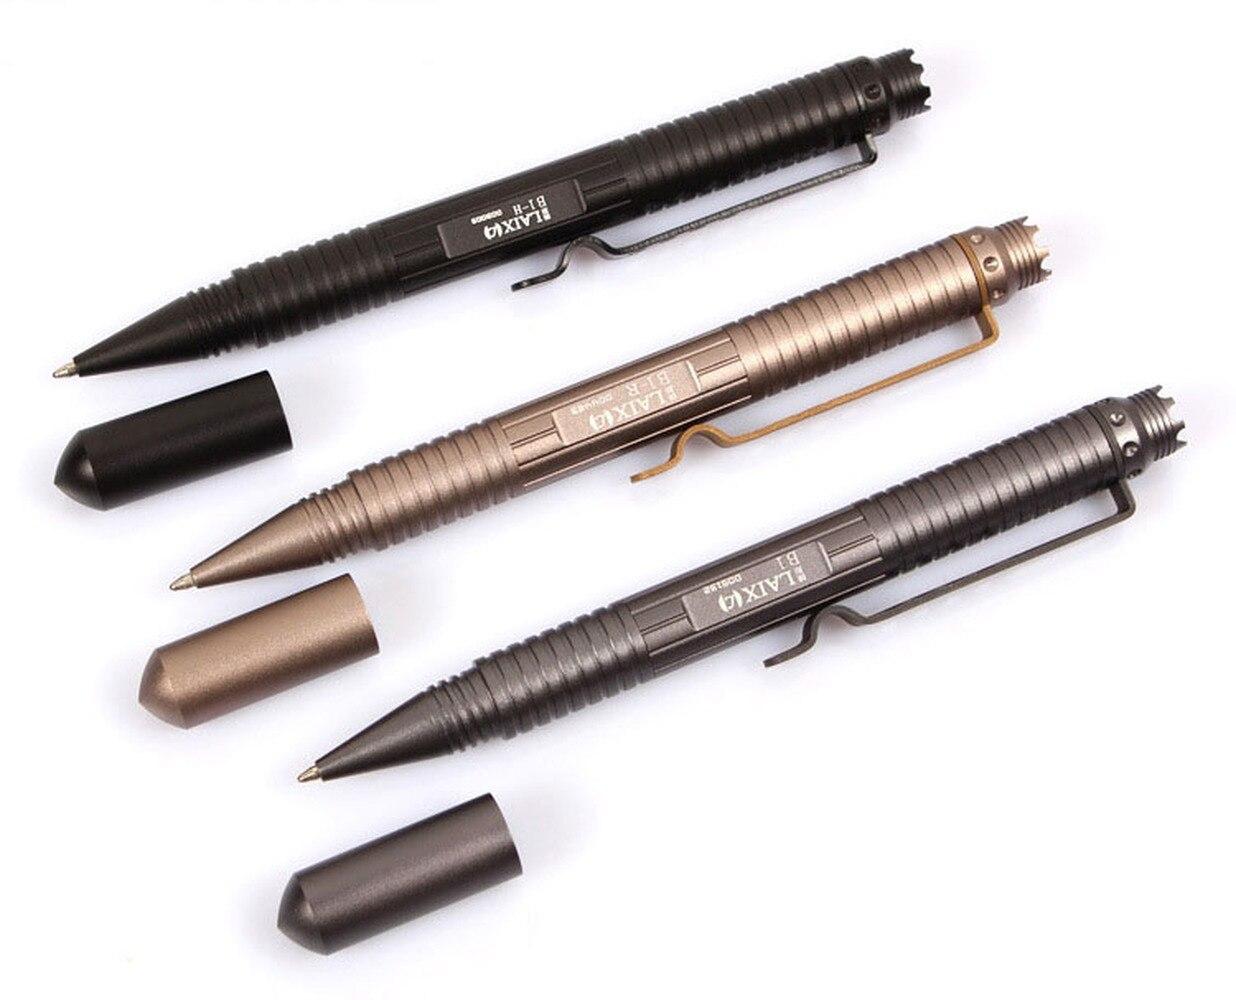 Multi-Function Tactical Pen Self Defense Glass Breaker Outdoor EDC Pen Tool Tungsten Steel Head Bolt Switch Gift Box